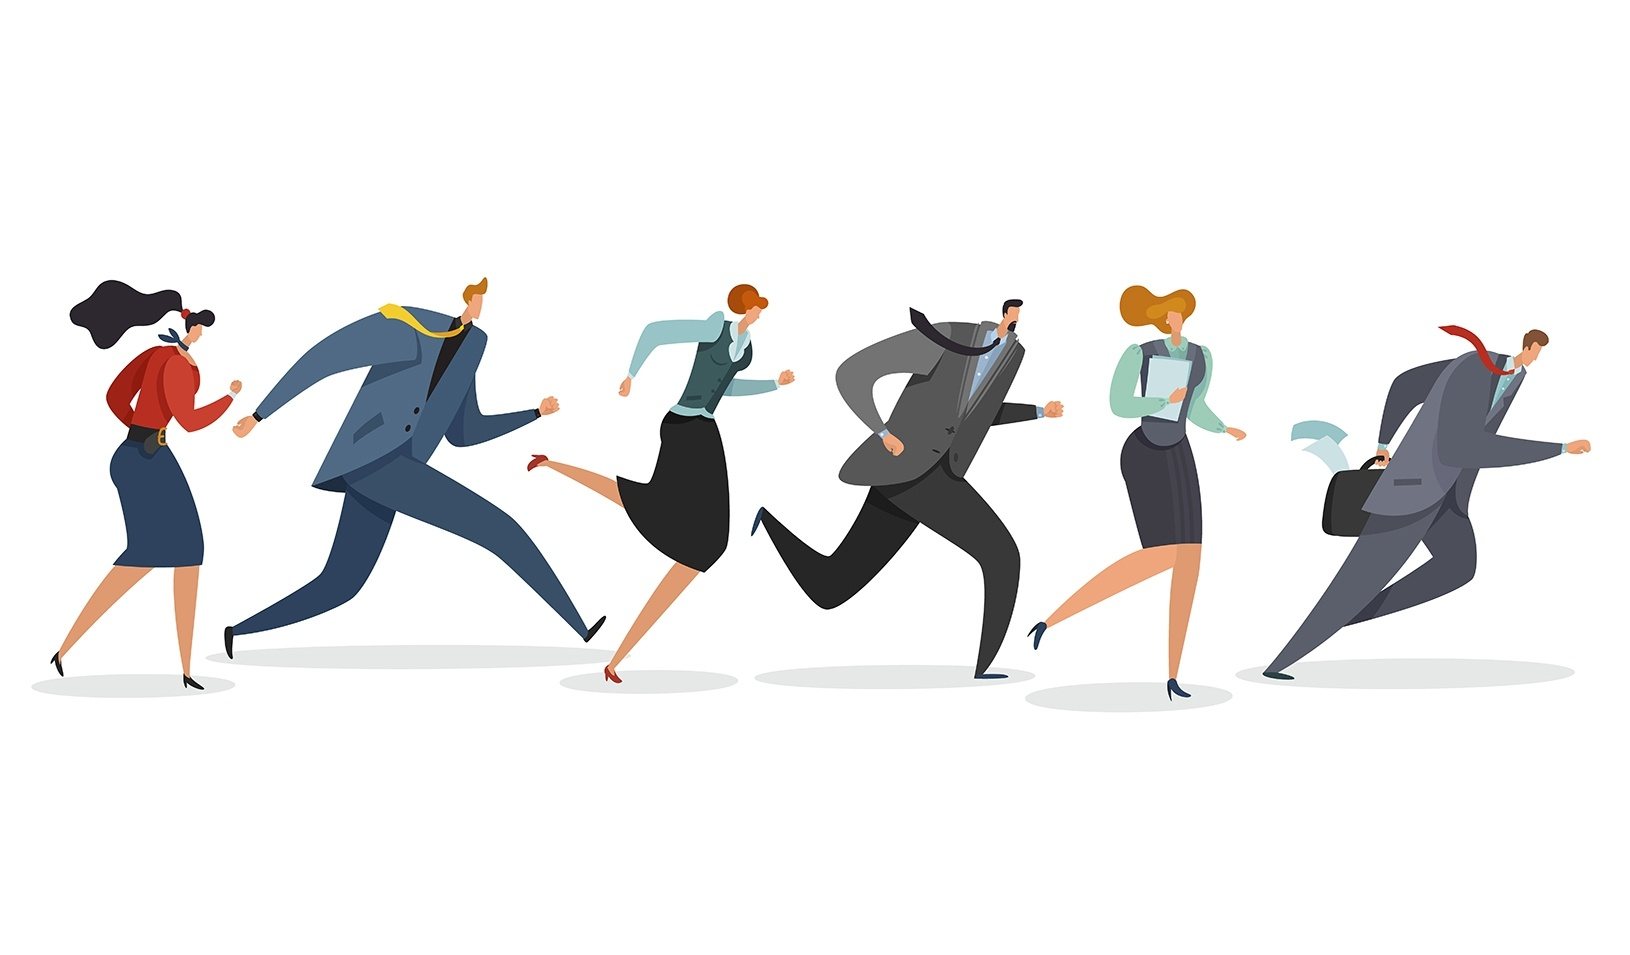 Illustration of business team running. Credit: iStock/Olga Kurbatova